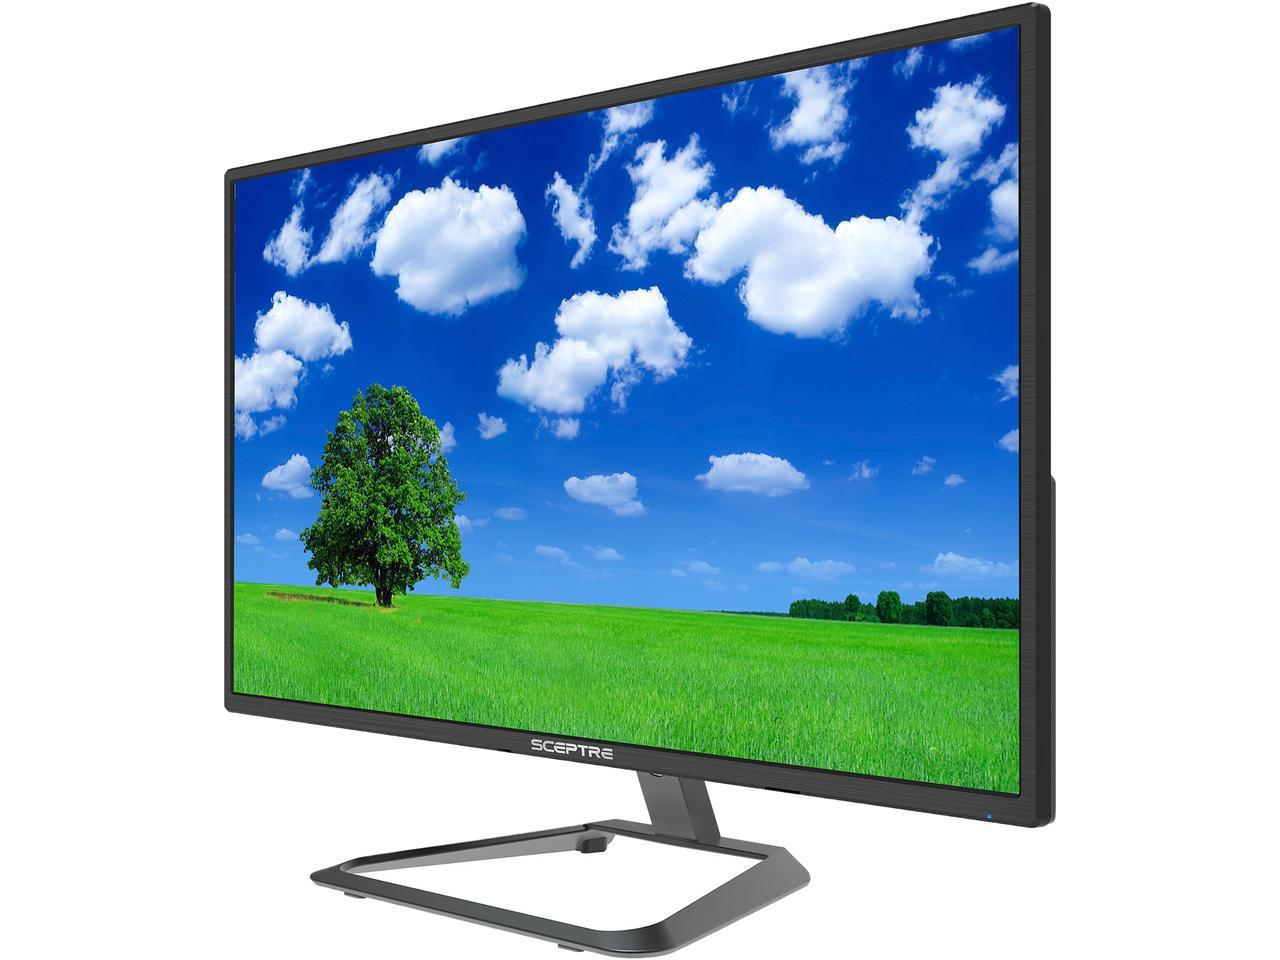 "27"" Sceptre U275W-4000R 4K UHD IPS LED Monitor $200 + Free Shipping"